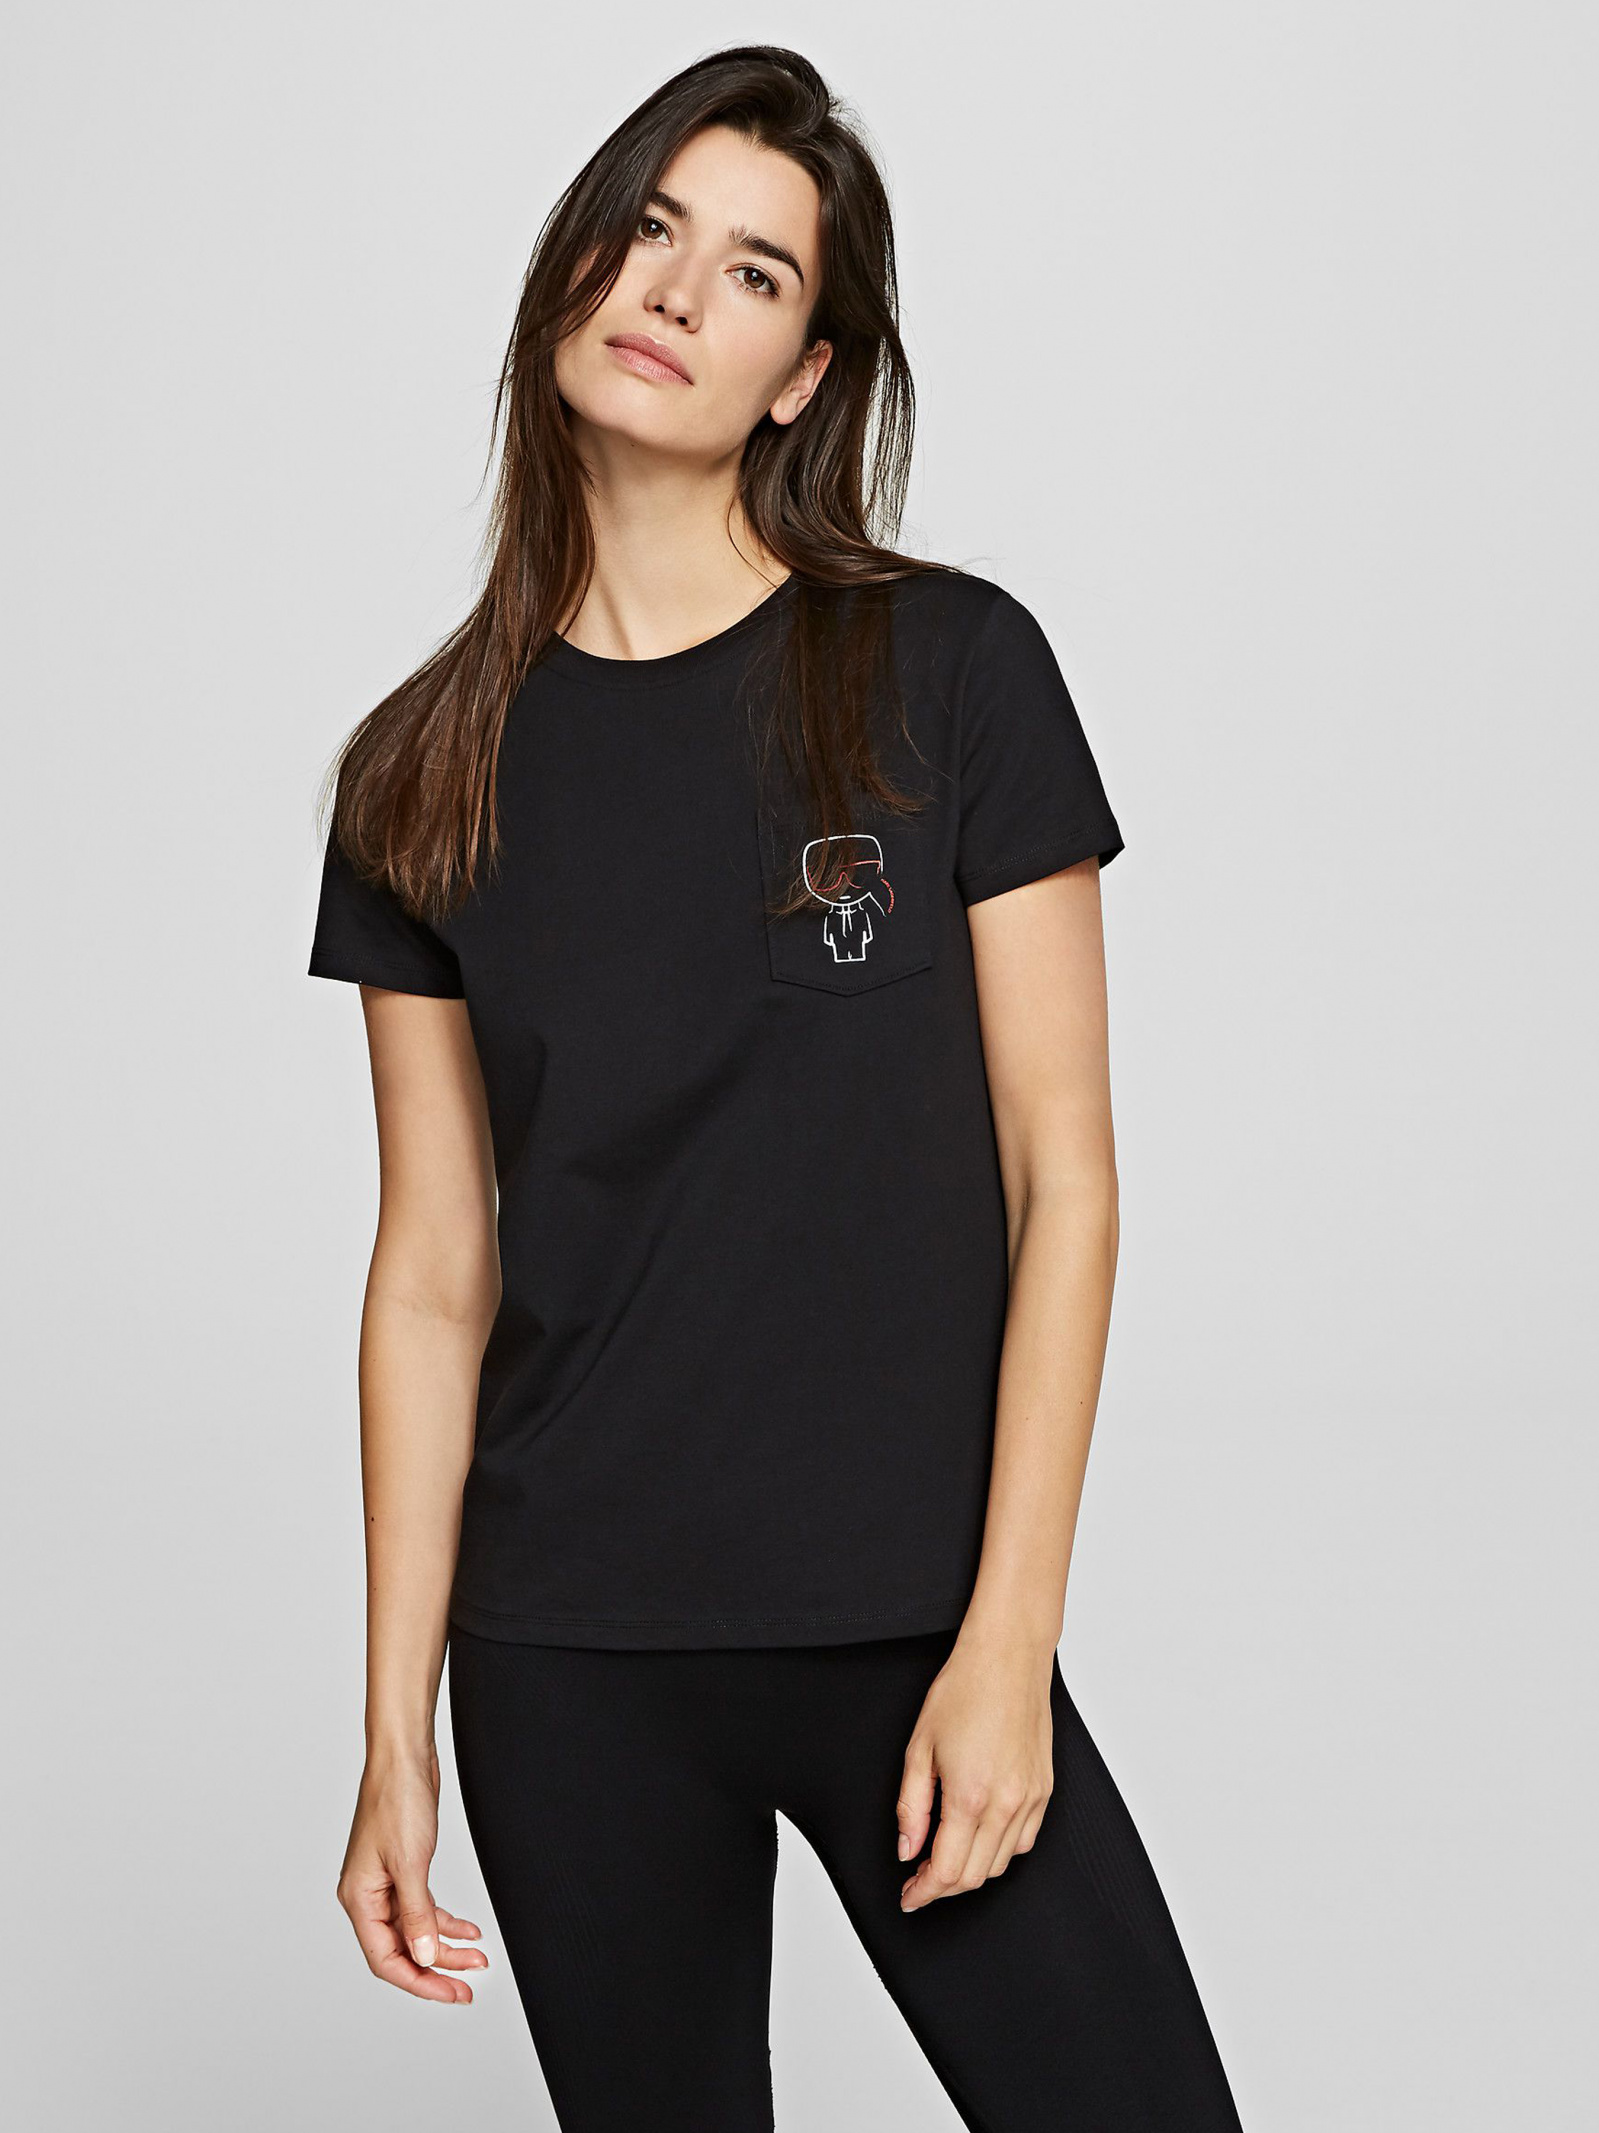 Футболка женские Karl Lagerfeld модель 201W1739_999_0041 приобрести, 2017